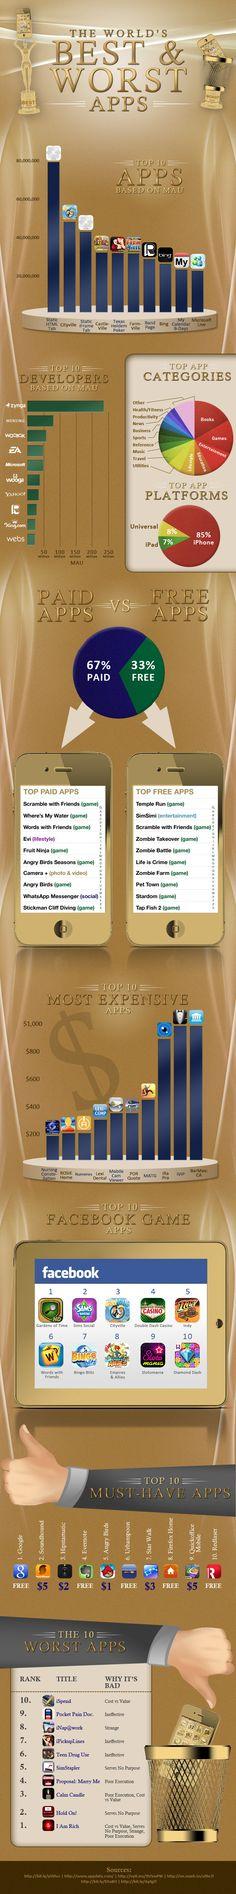 Leanna The World's Best & Worst Apps